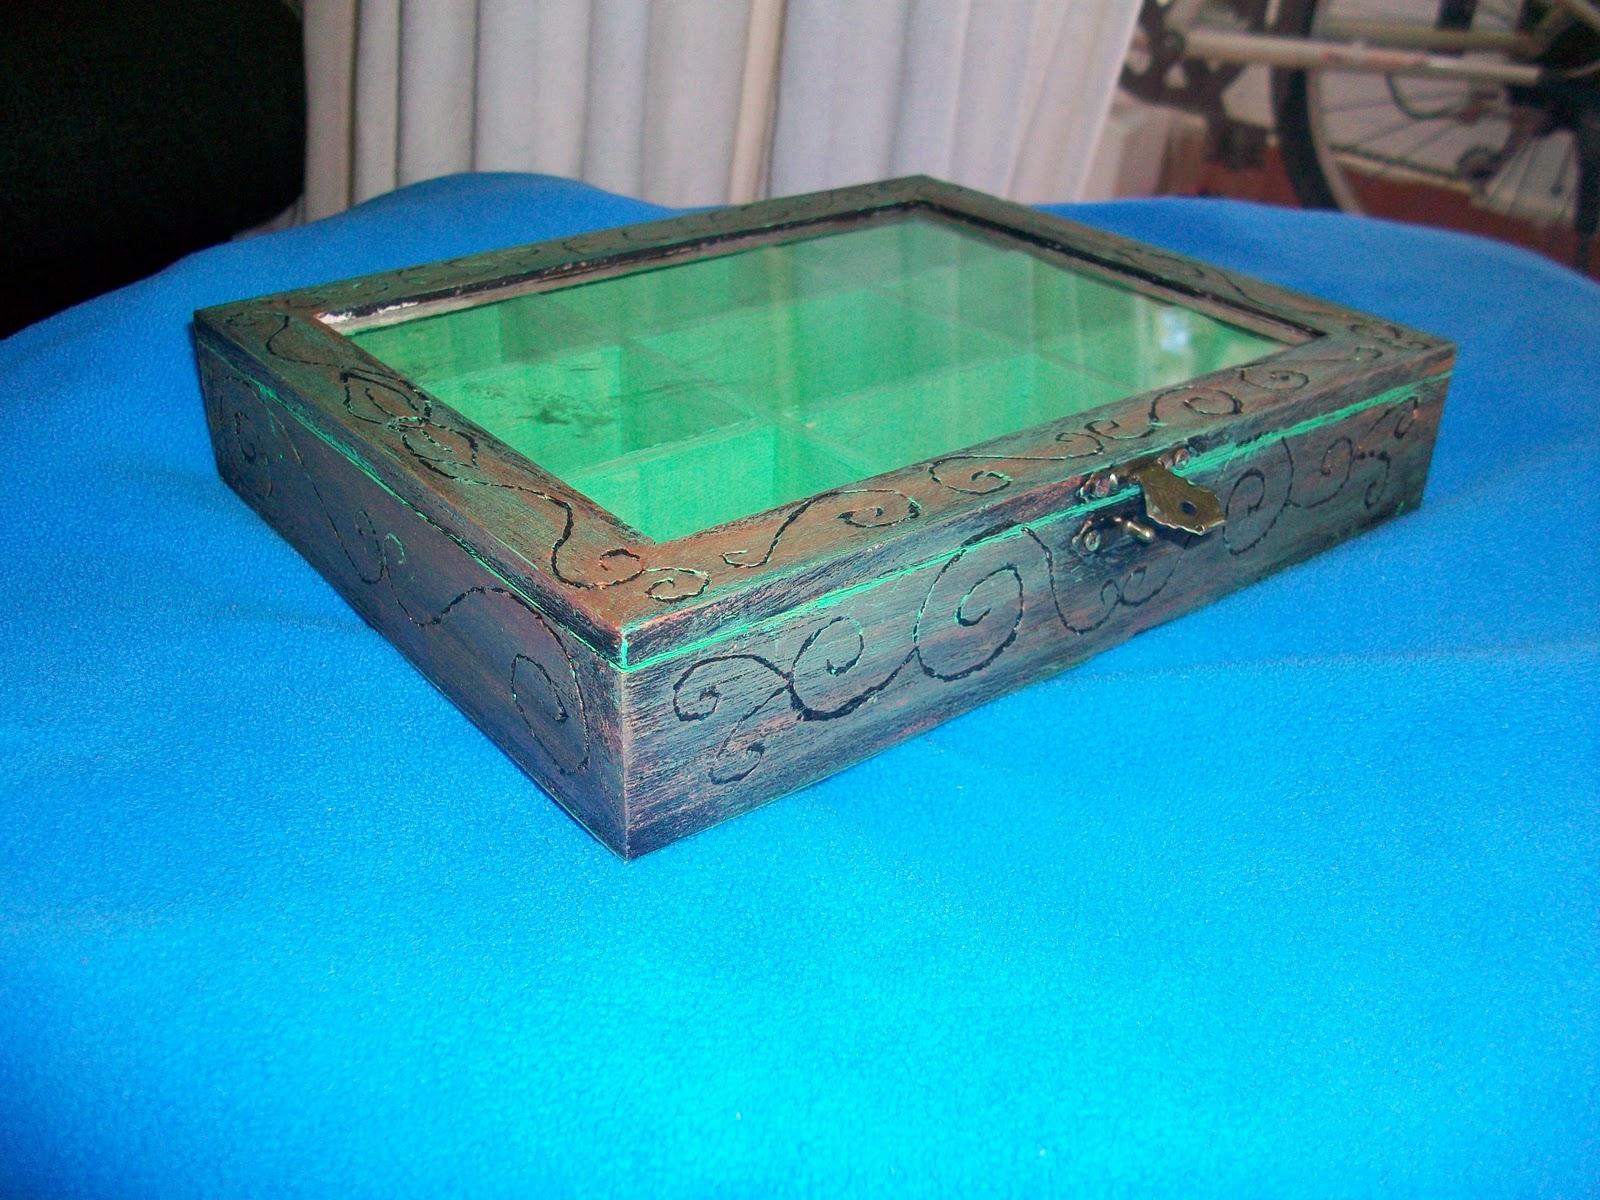 Artesan a y manualidades gir n caja de madera para las - Cajas de madera manualidades ...